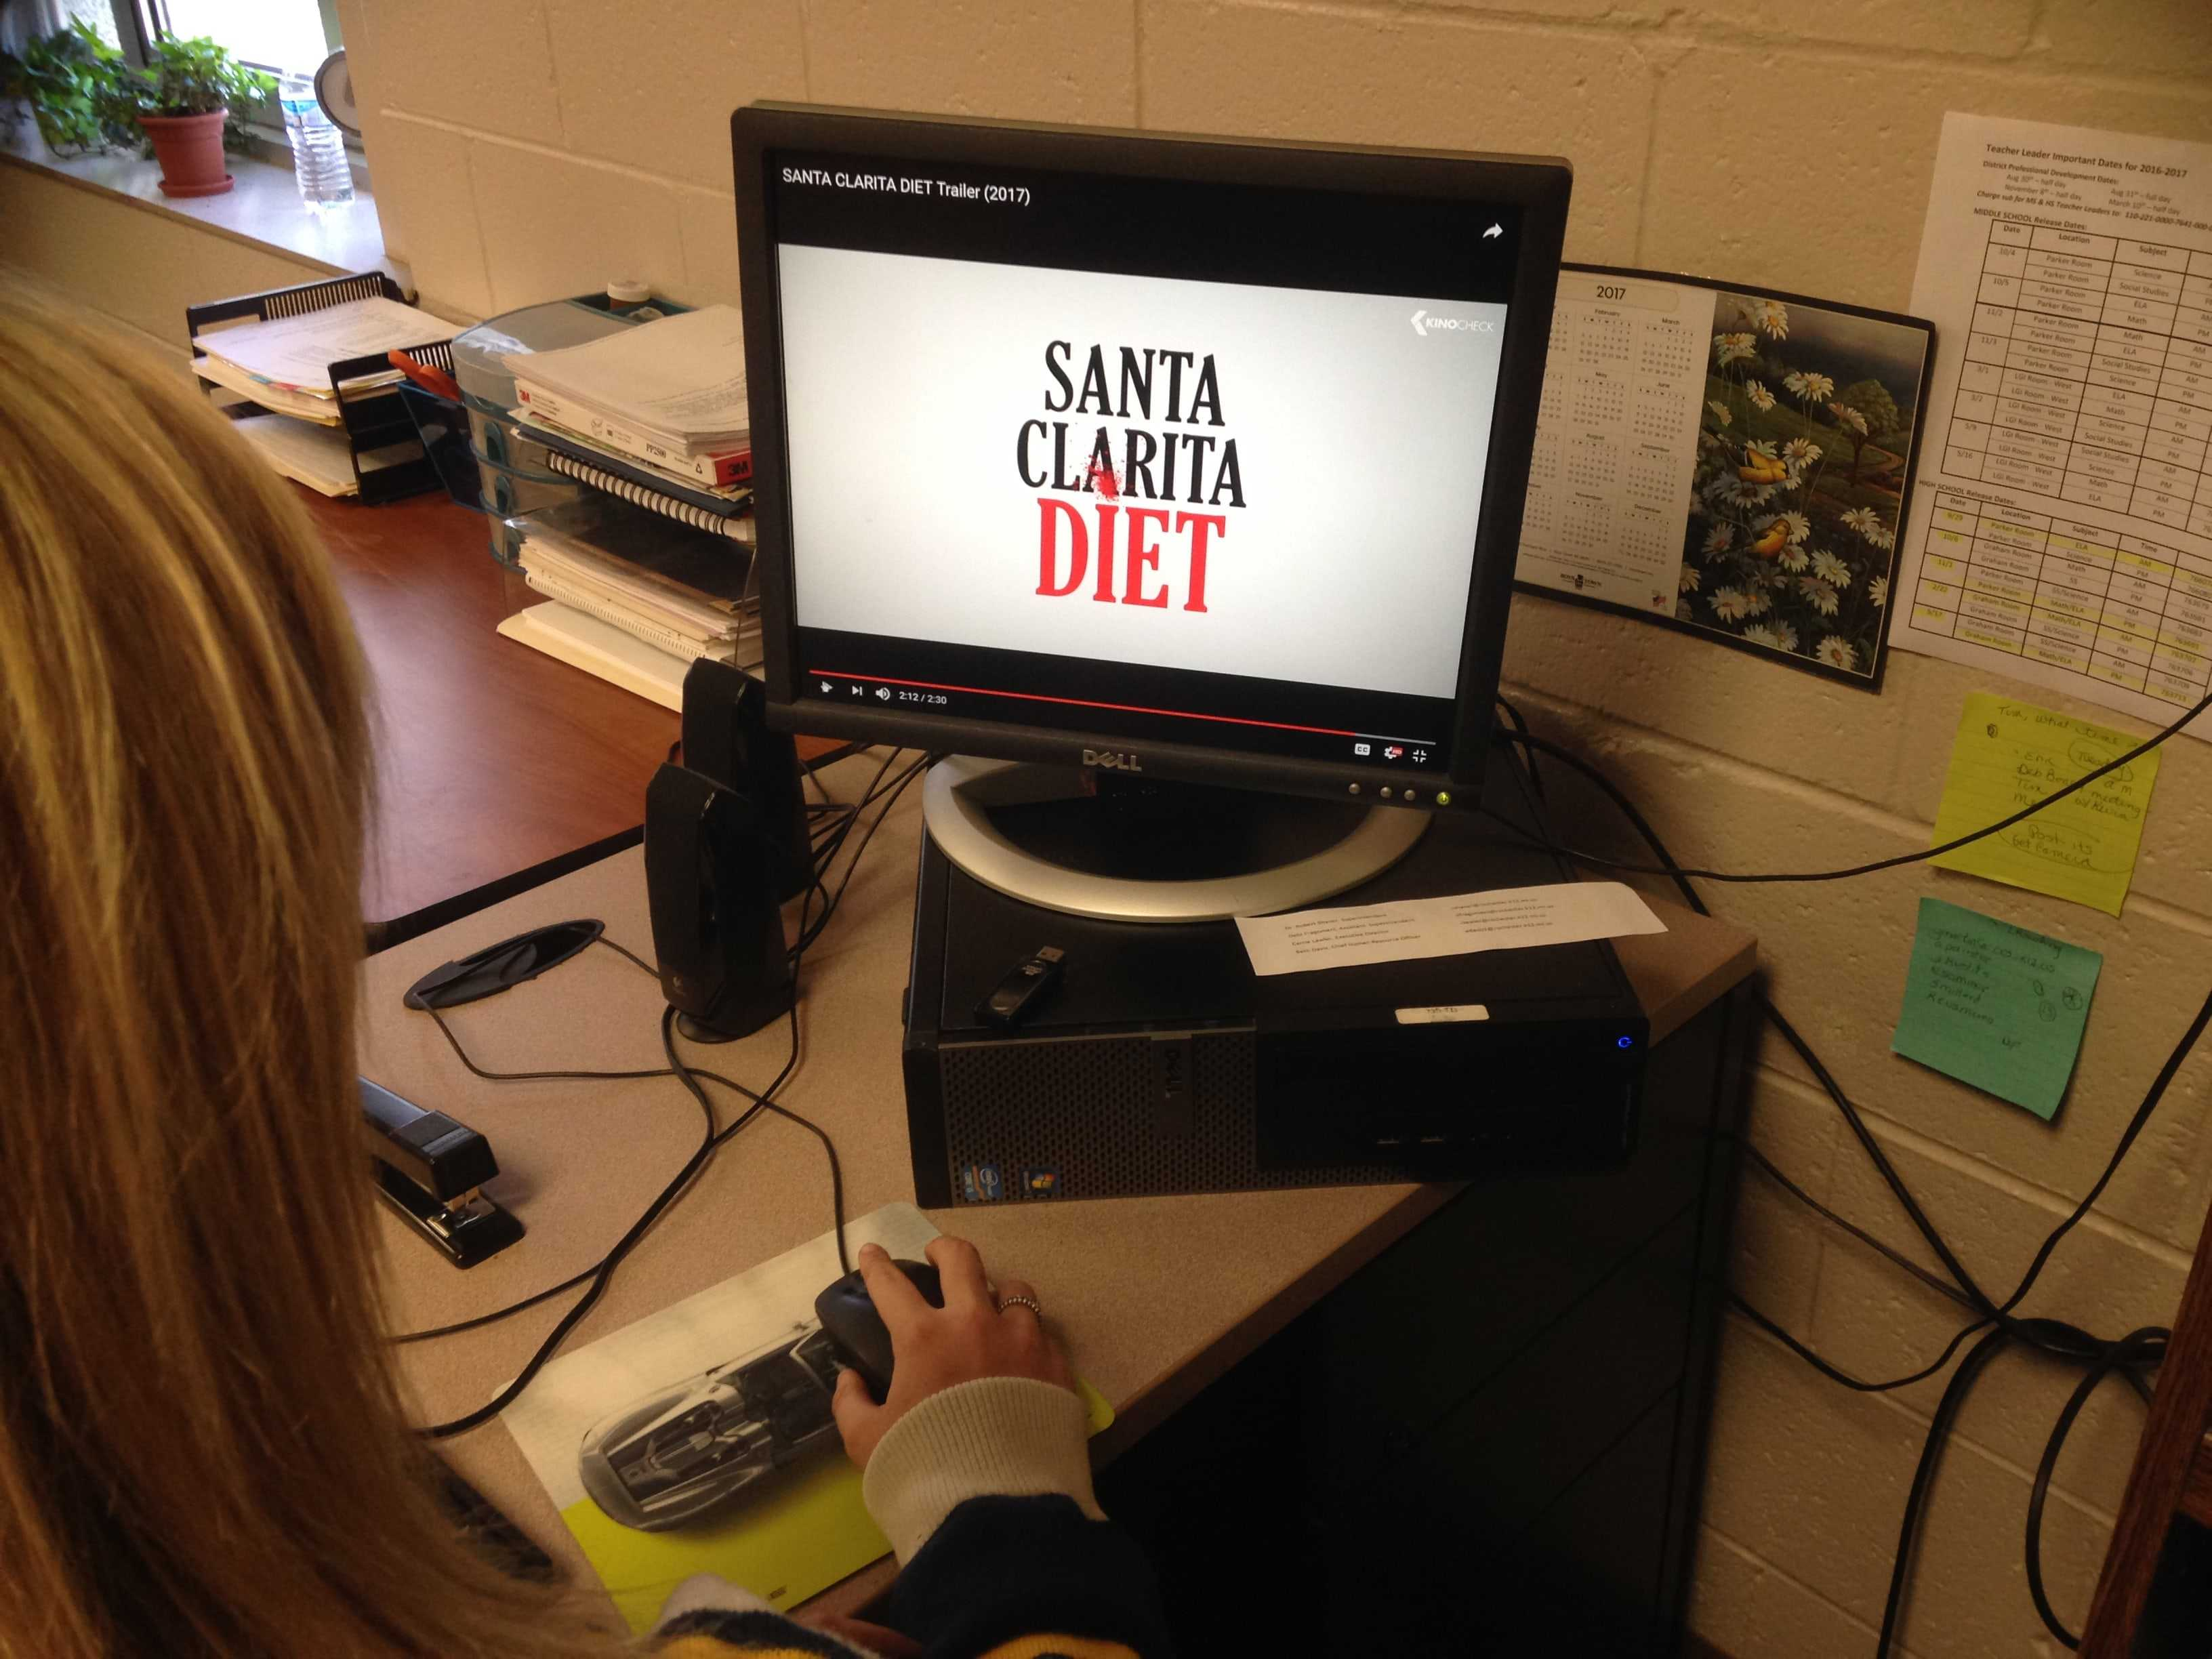 Santa Clarita Diet is available to stream on Netflix.